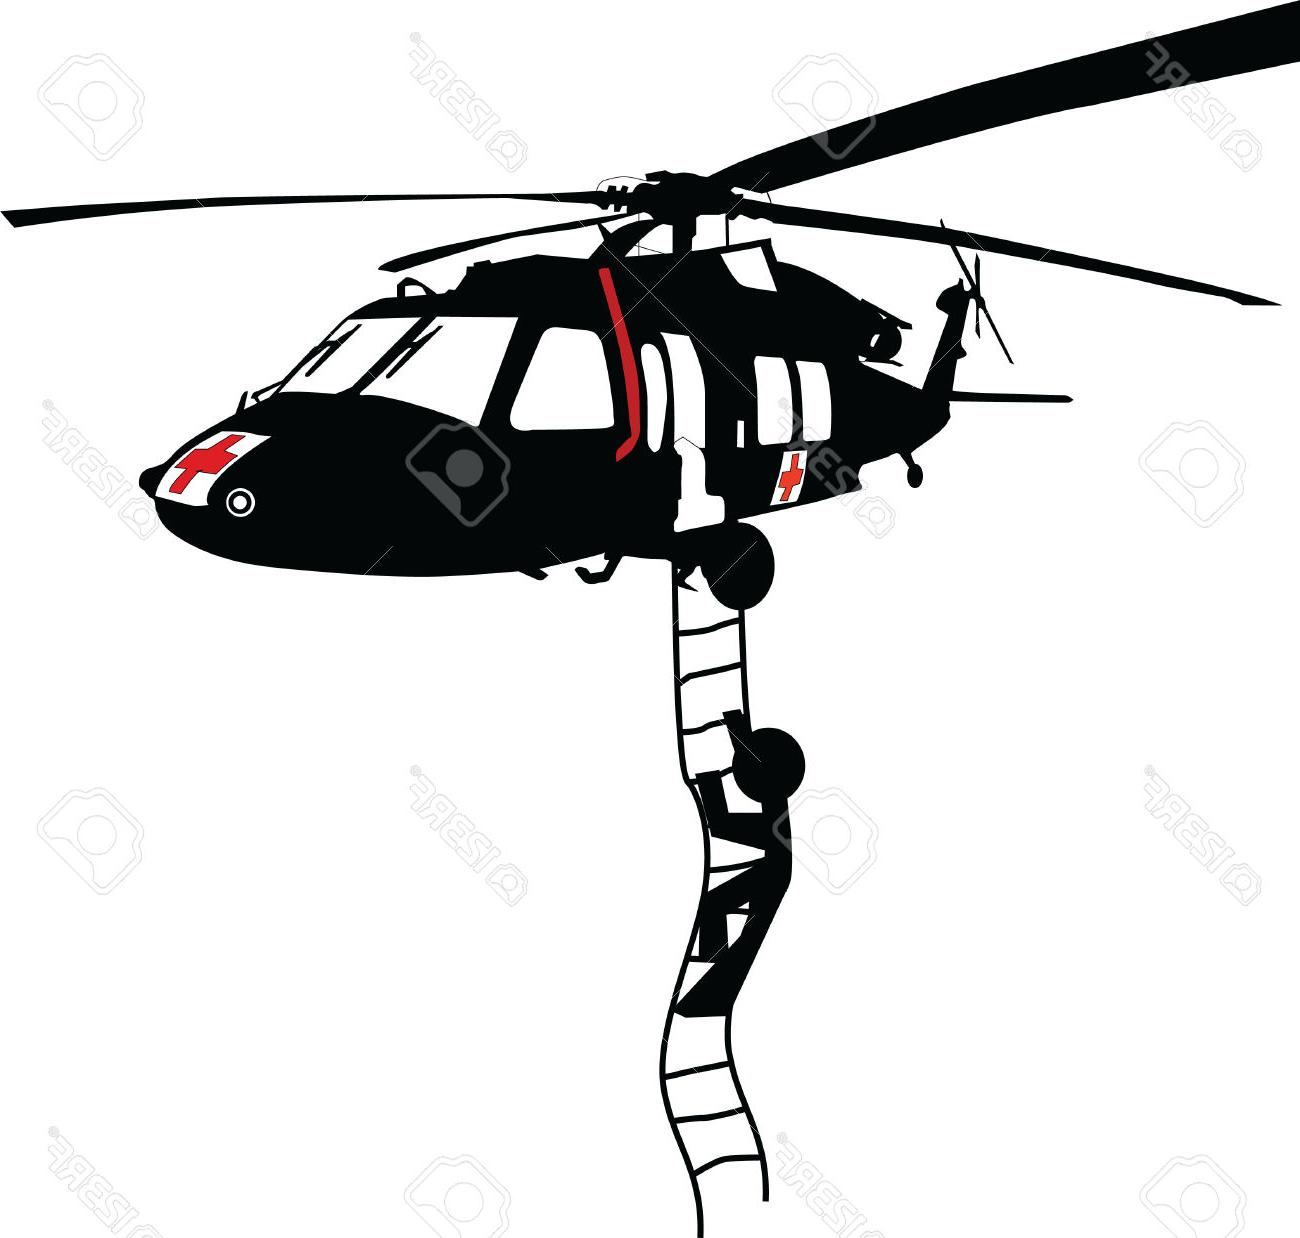 Top Blackhawk Helicopter Vector Image ~ Vector Images Design.